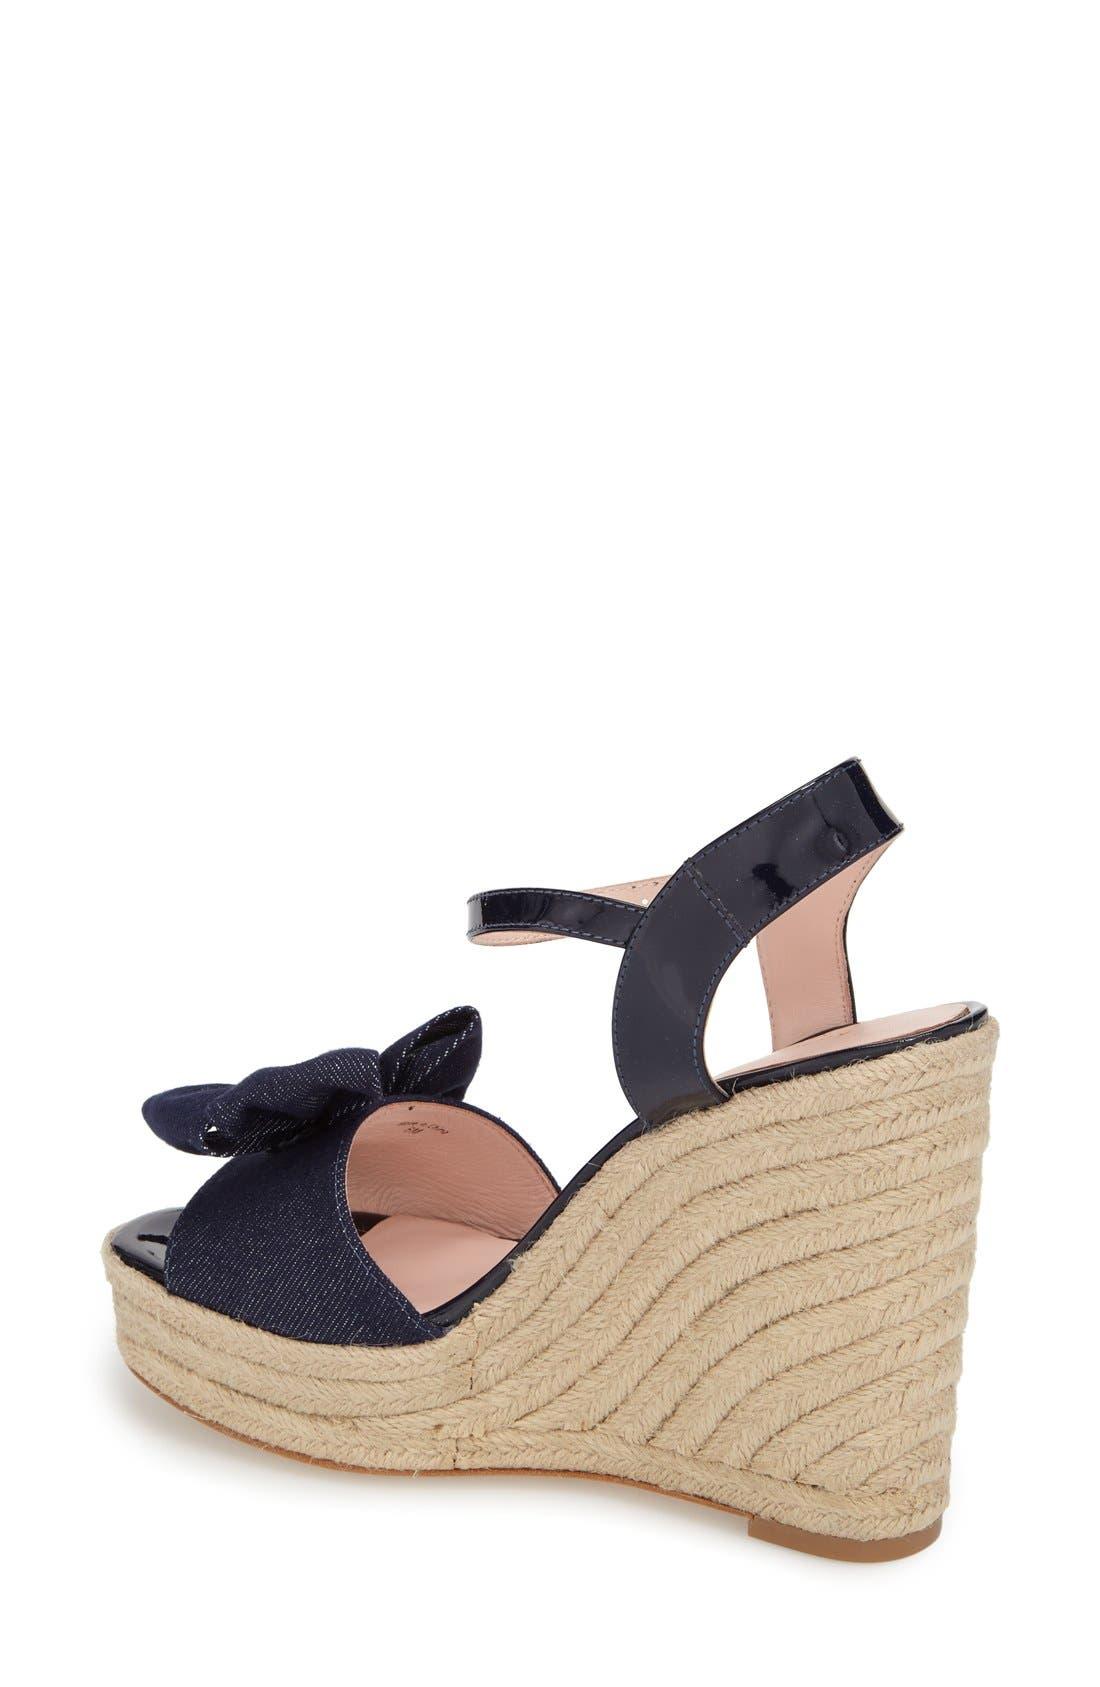 Alternate Image 2  - kate spade new york 'darya' wedge sandal (Women)